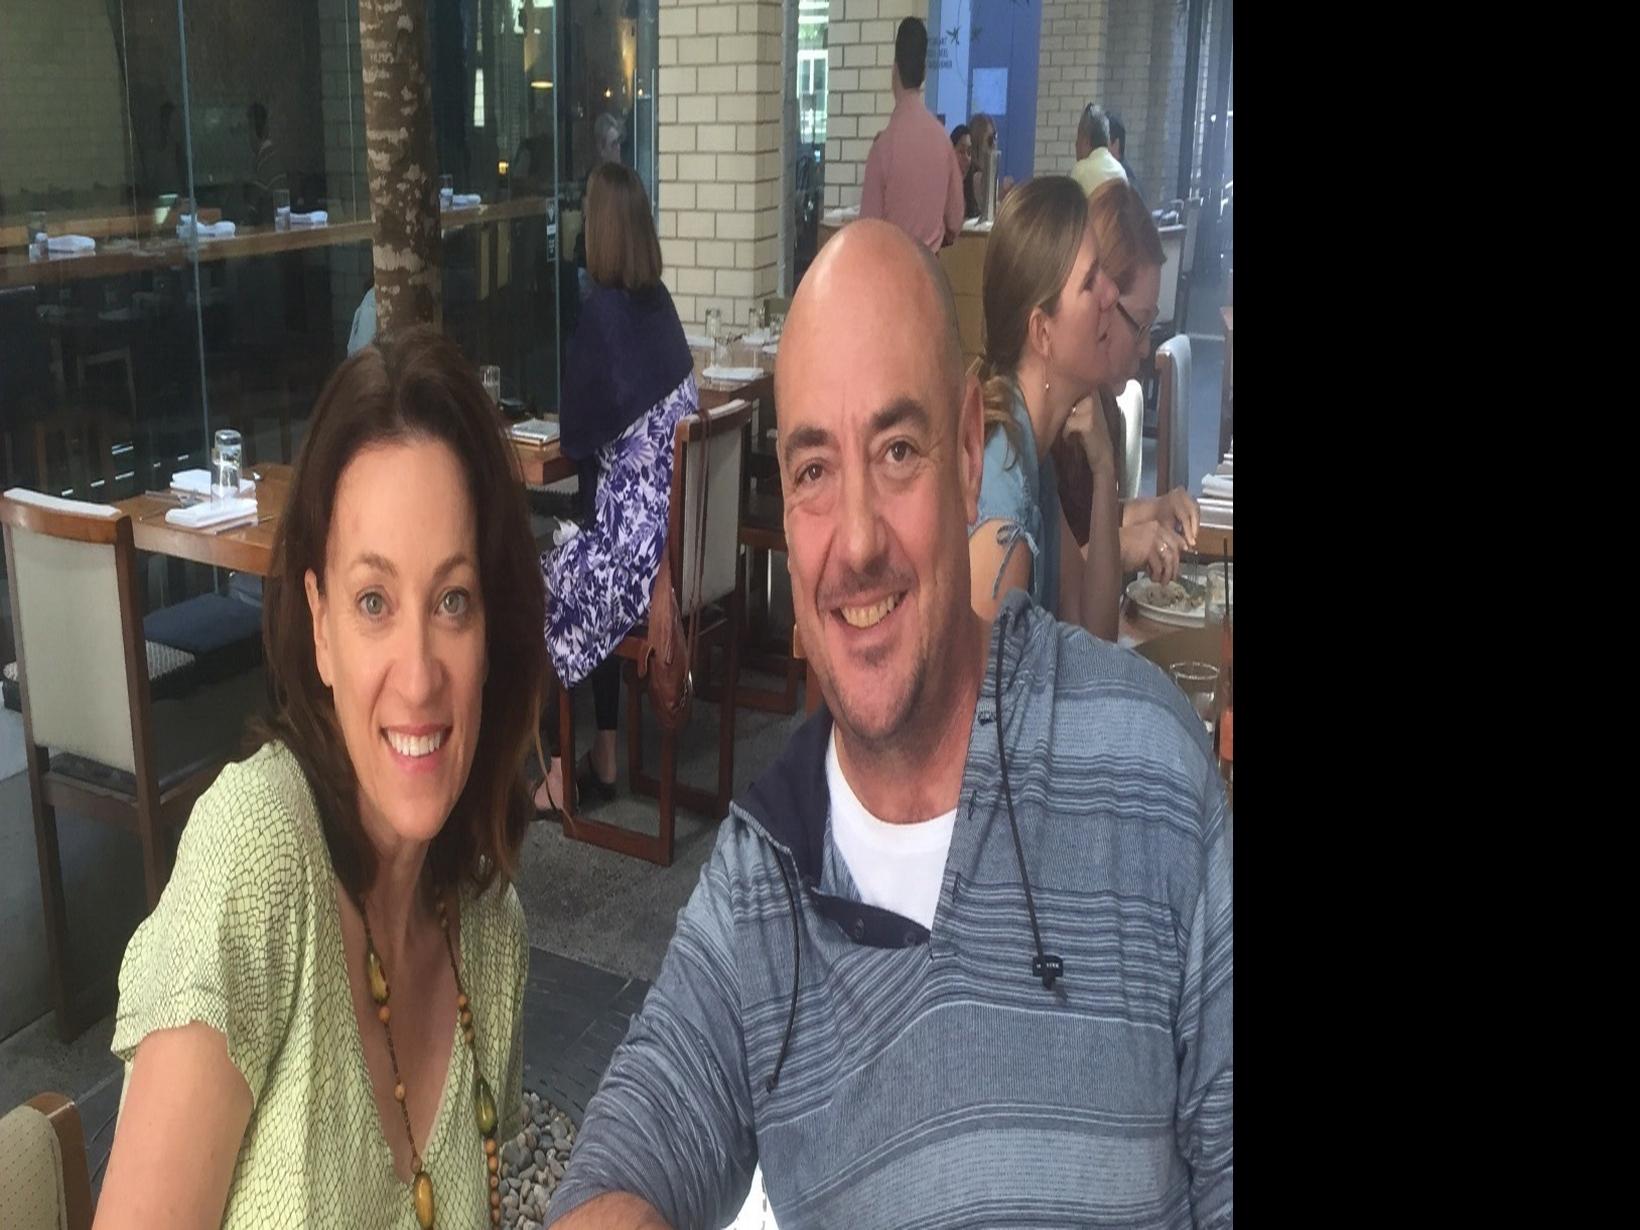 Megan & Chris from Wagga Wagga, New South Wales, Australia